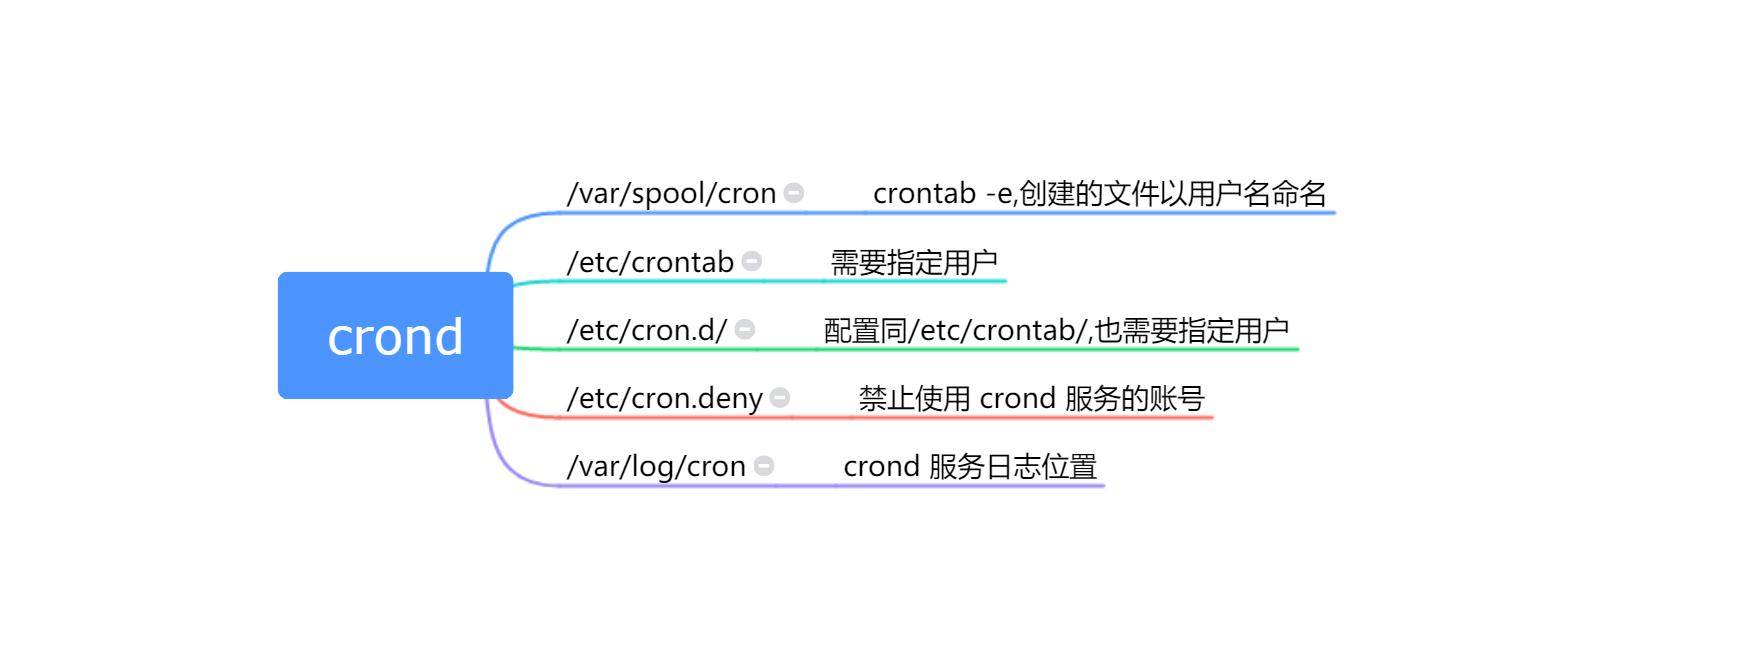 Linux 定时任务 crontab 和 Systemd Timer 详解